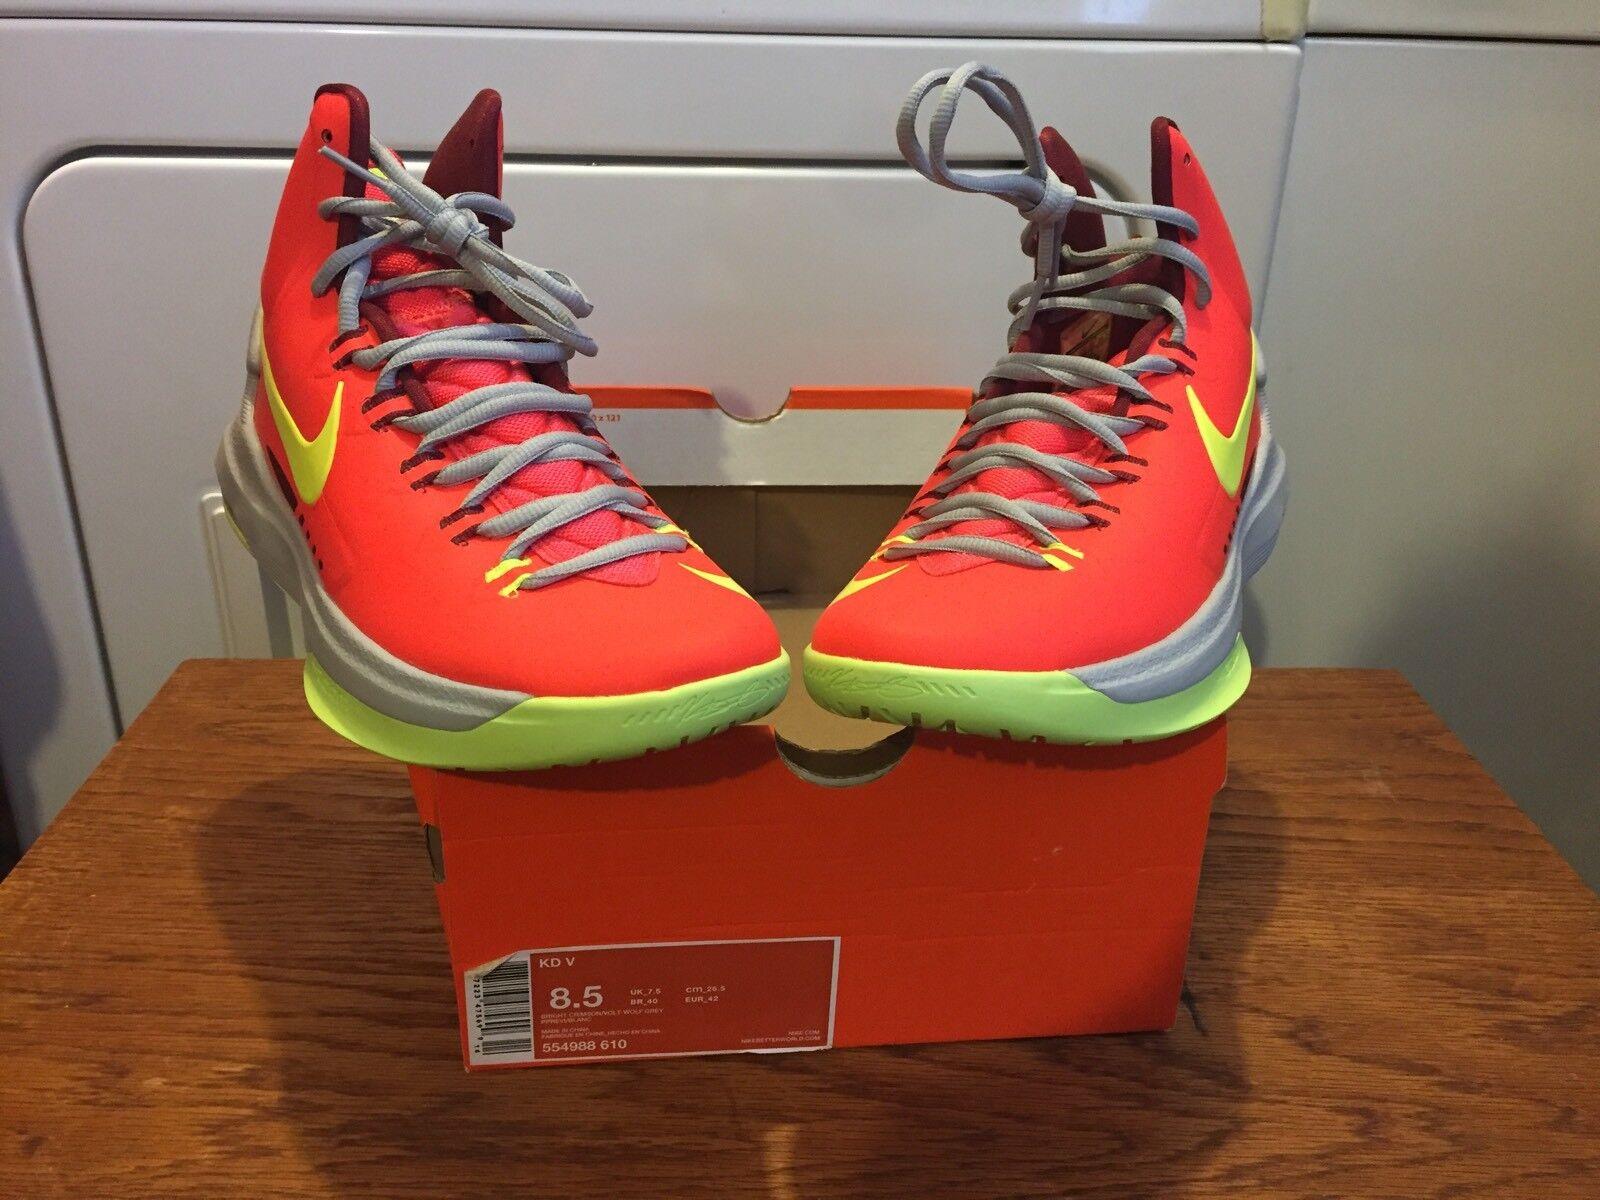 Nike Zoom Kevin Durant KD naranja V 5 MVP Crimson naranja KD Volt Wolf Gris SZ 8,5 playoffs 7003bd